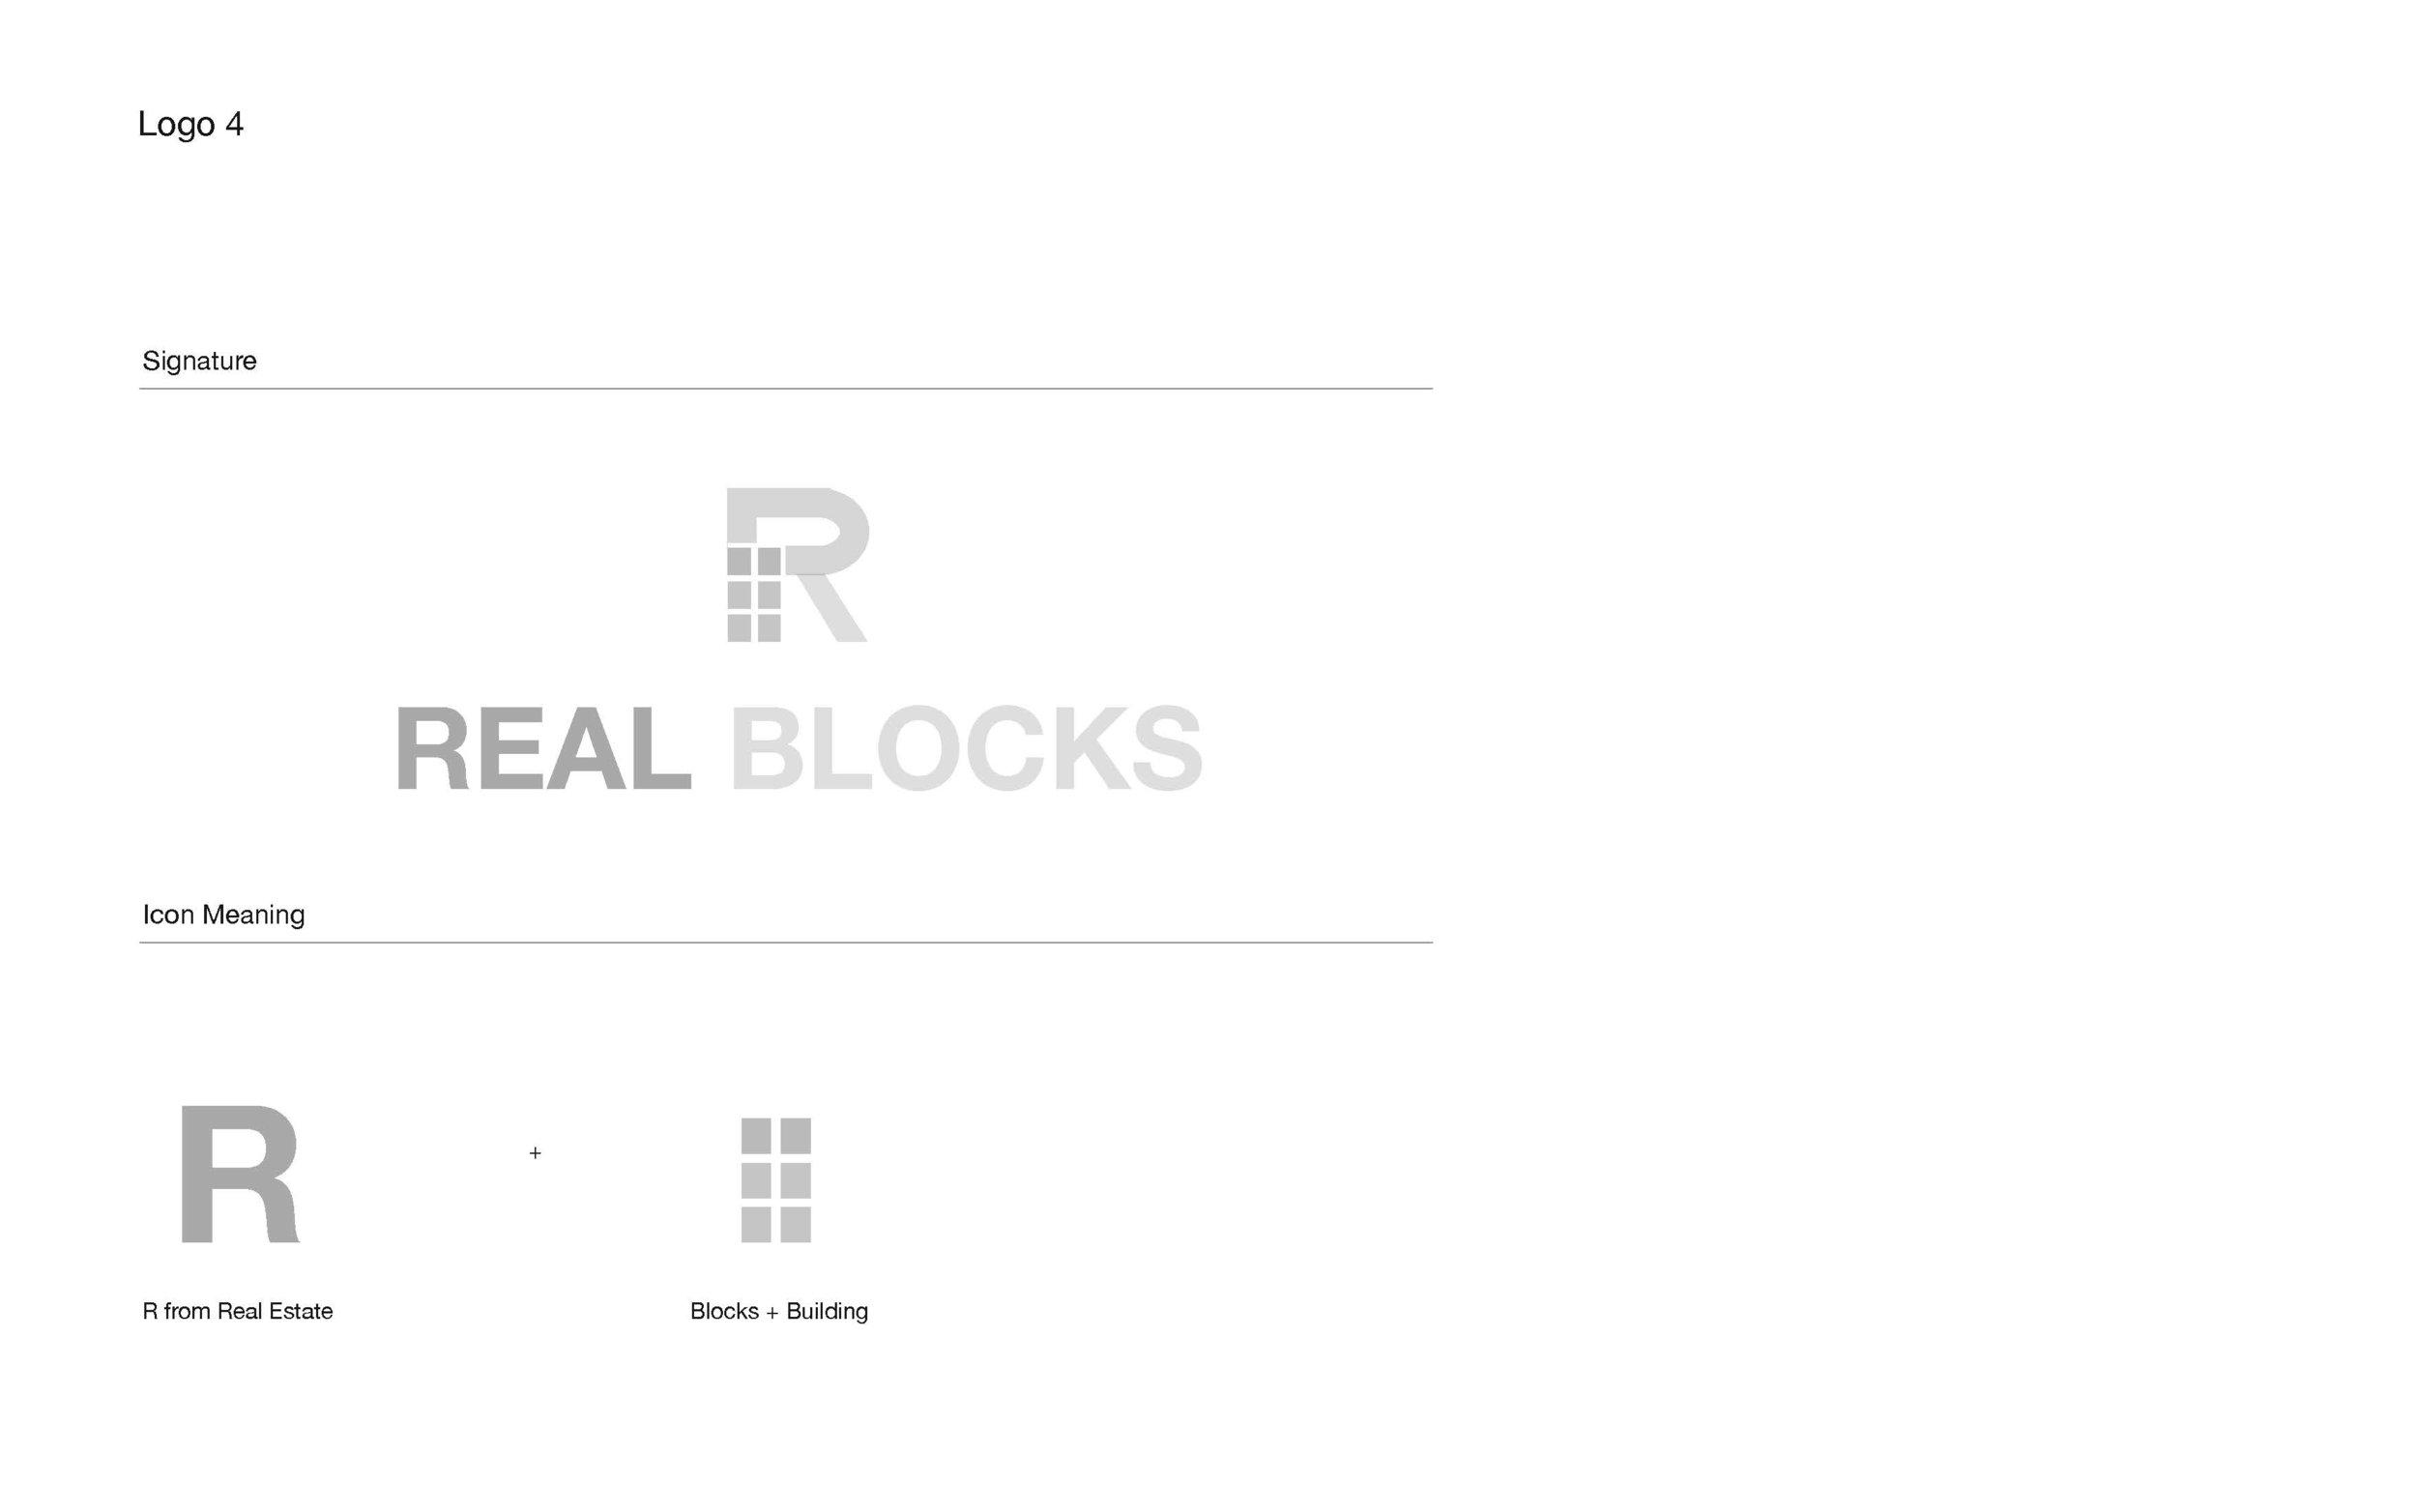 realblocks_logo_Page_5.jpg